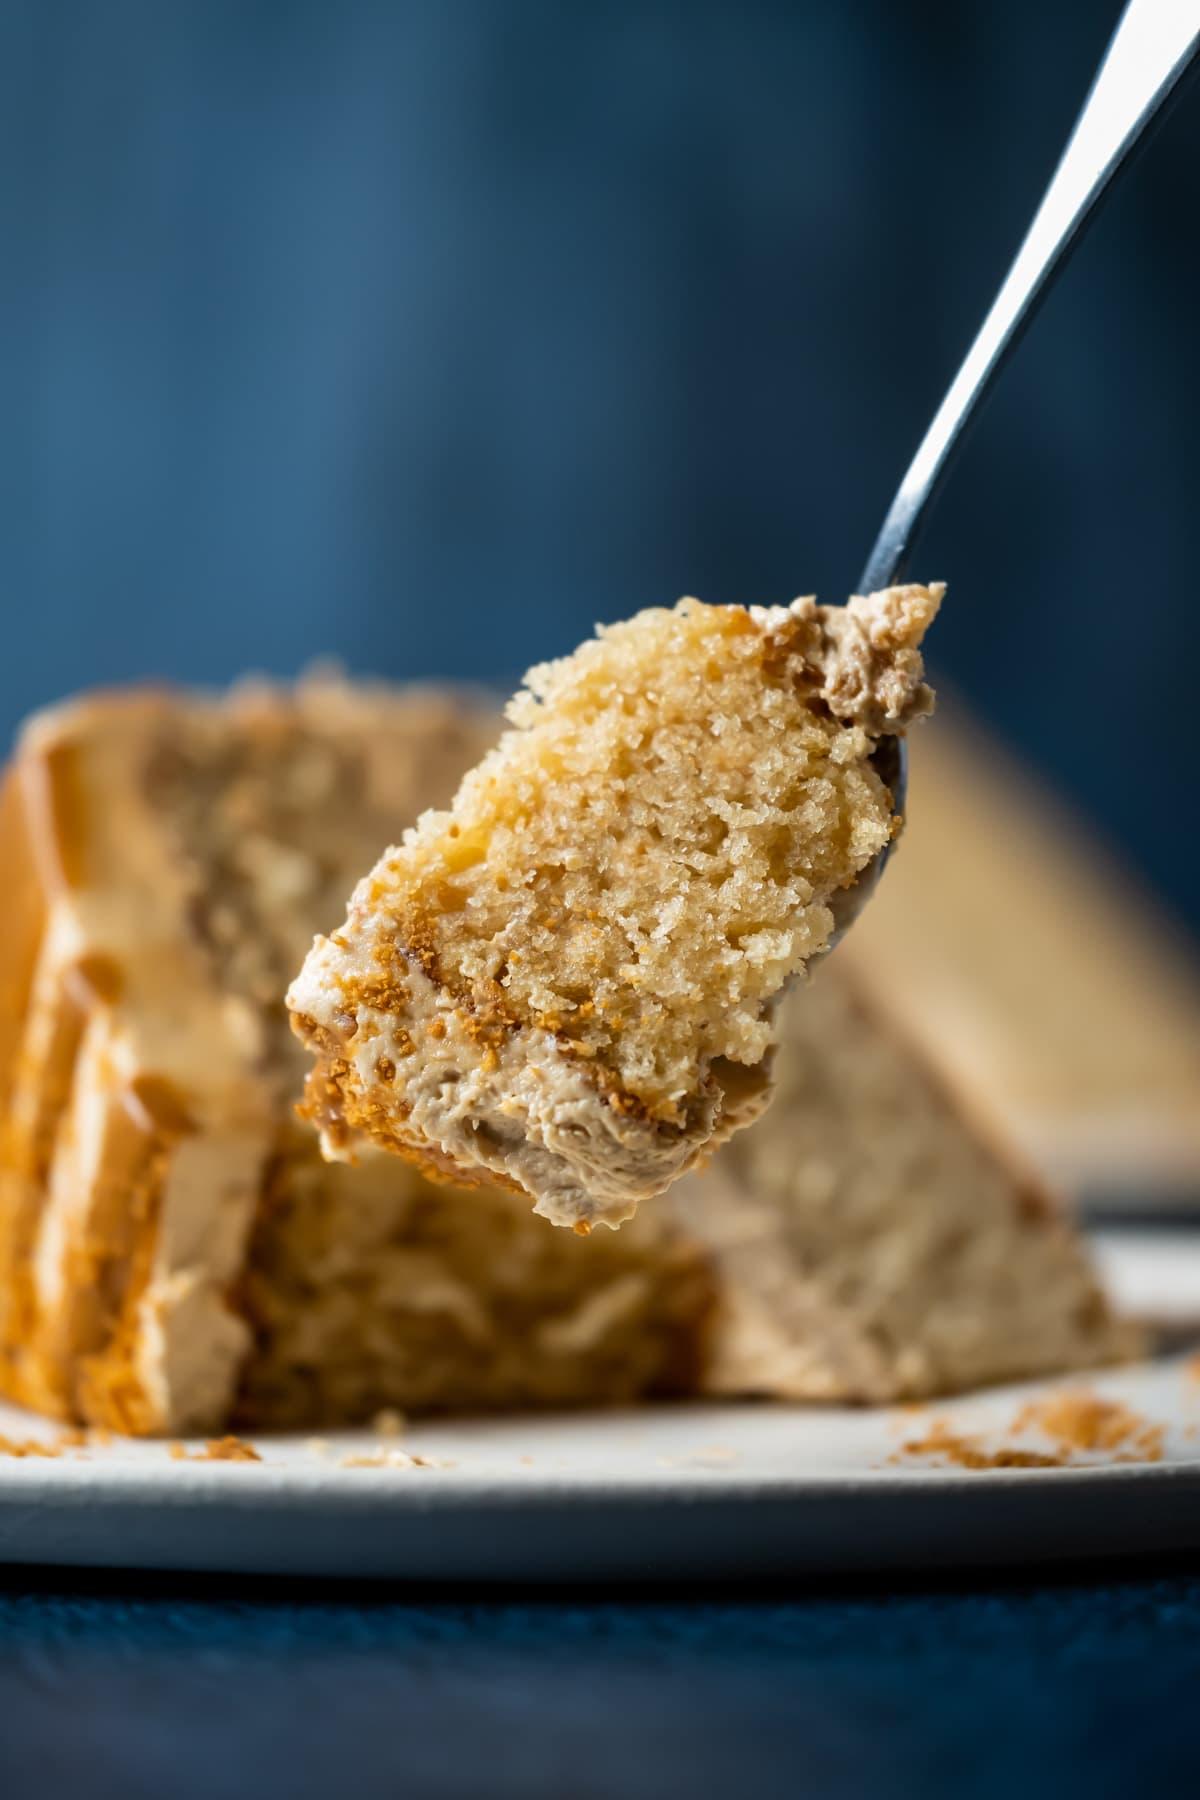 Forkful of biscoff cake.